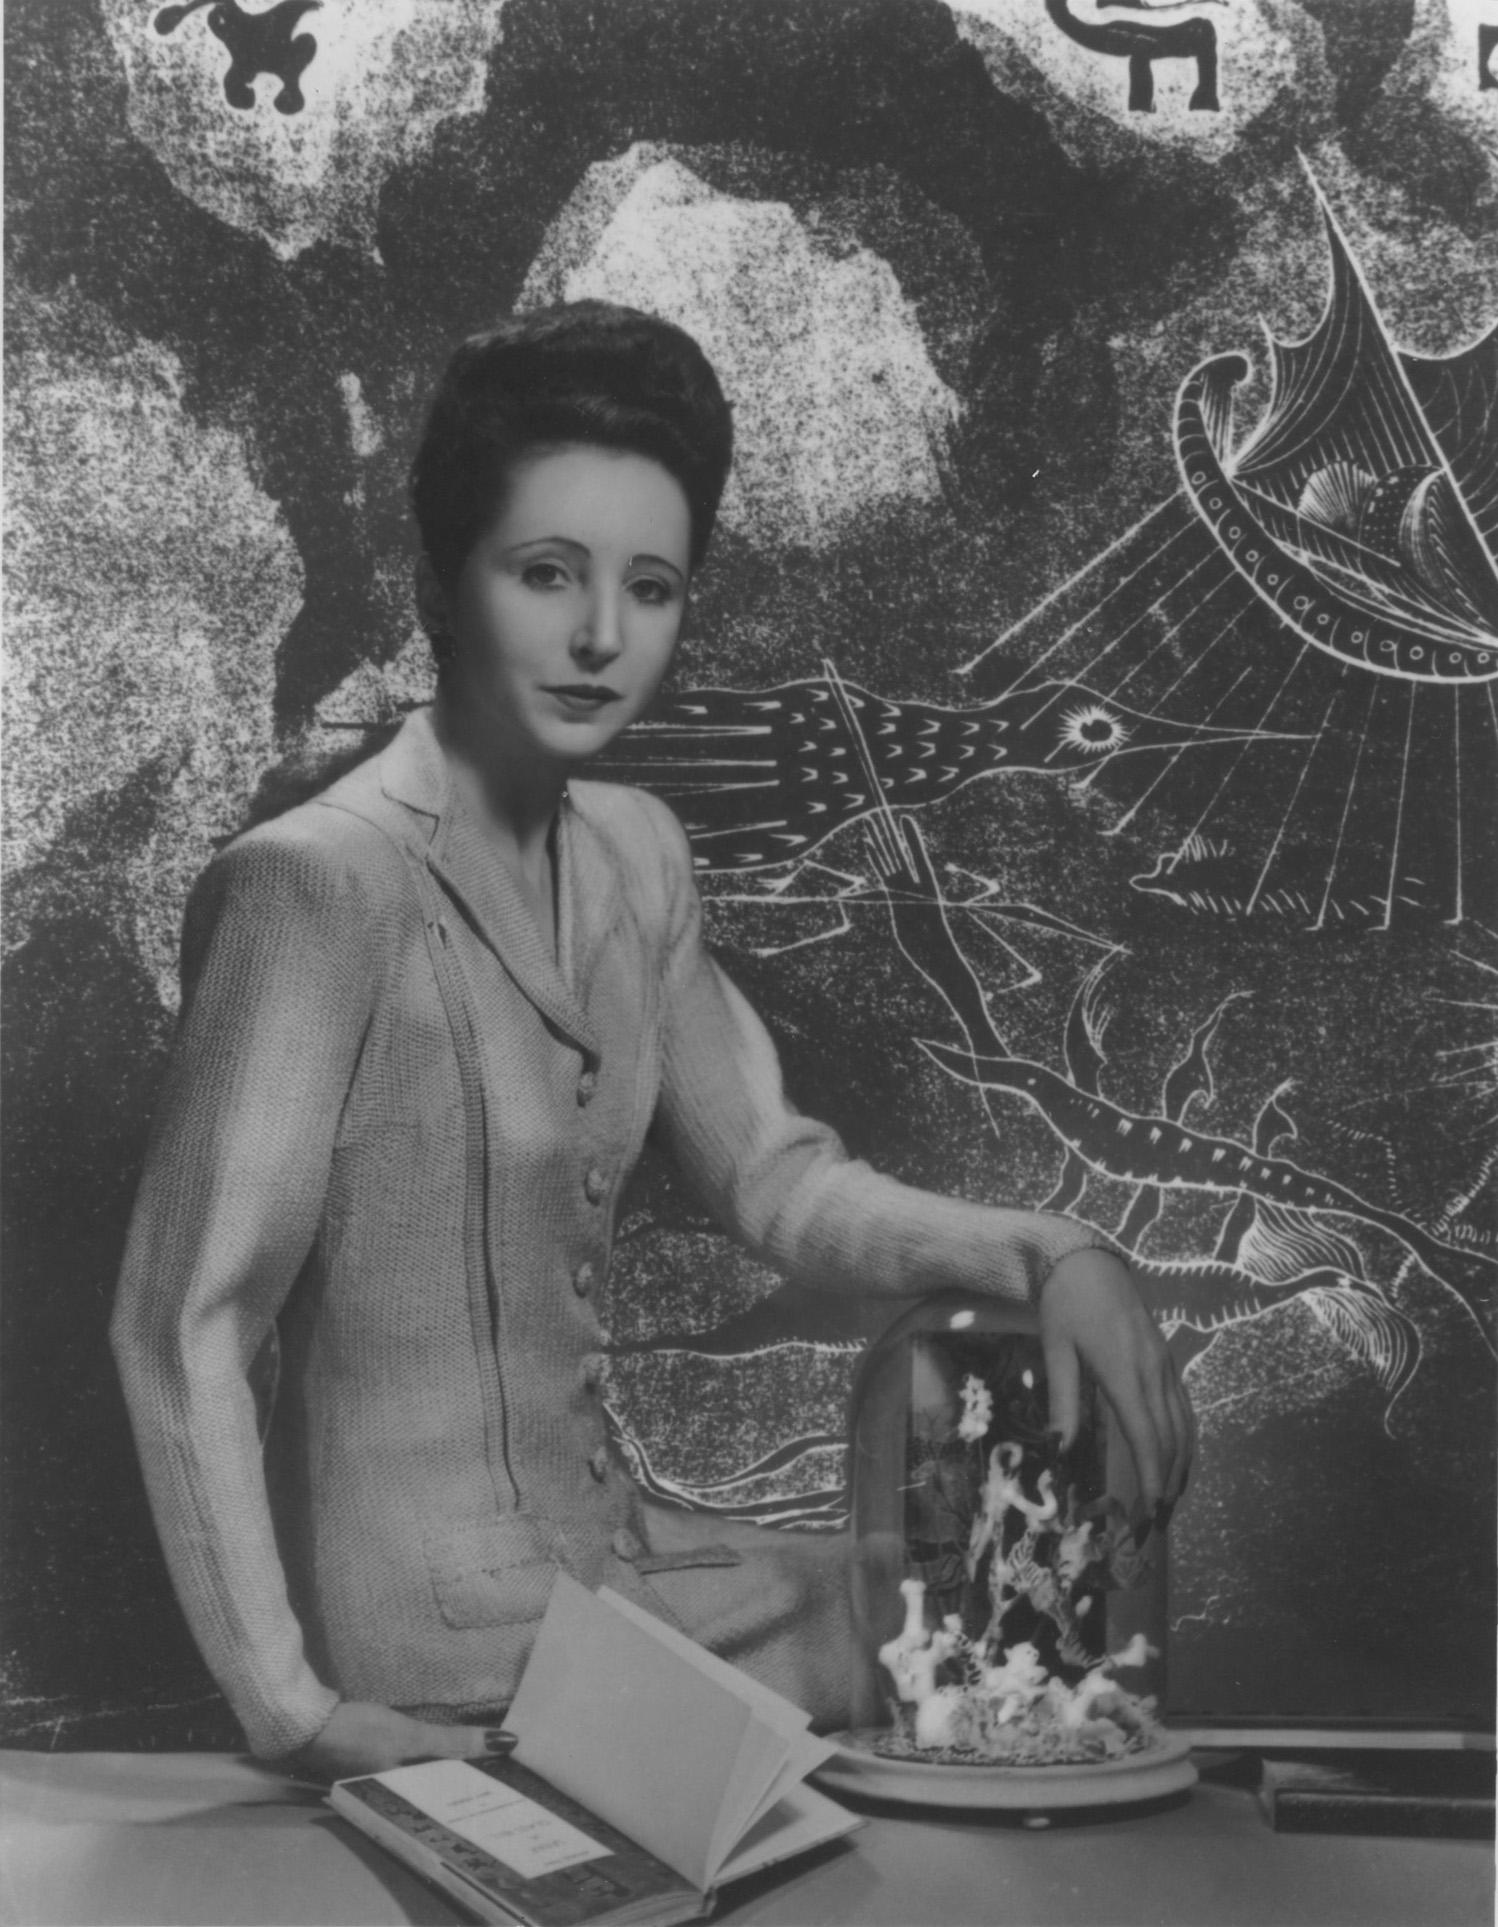 1950s+Hugo's+art+background